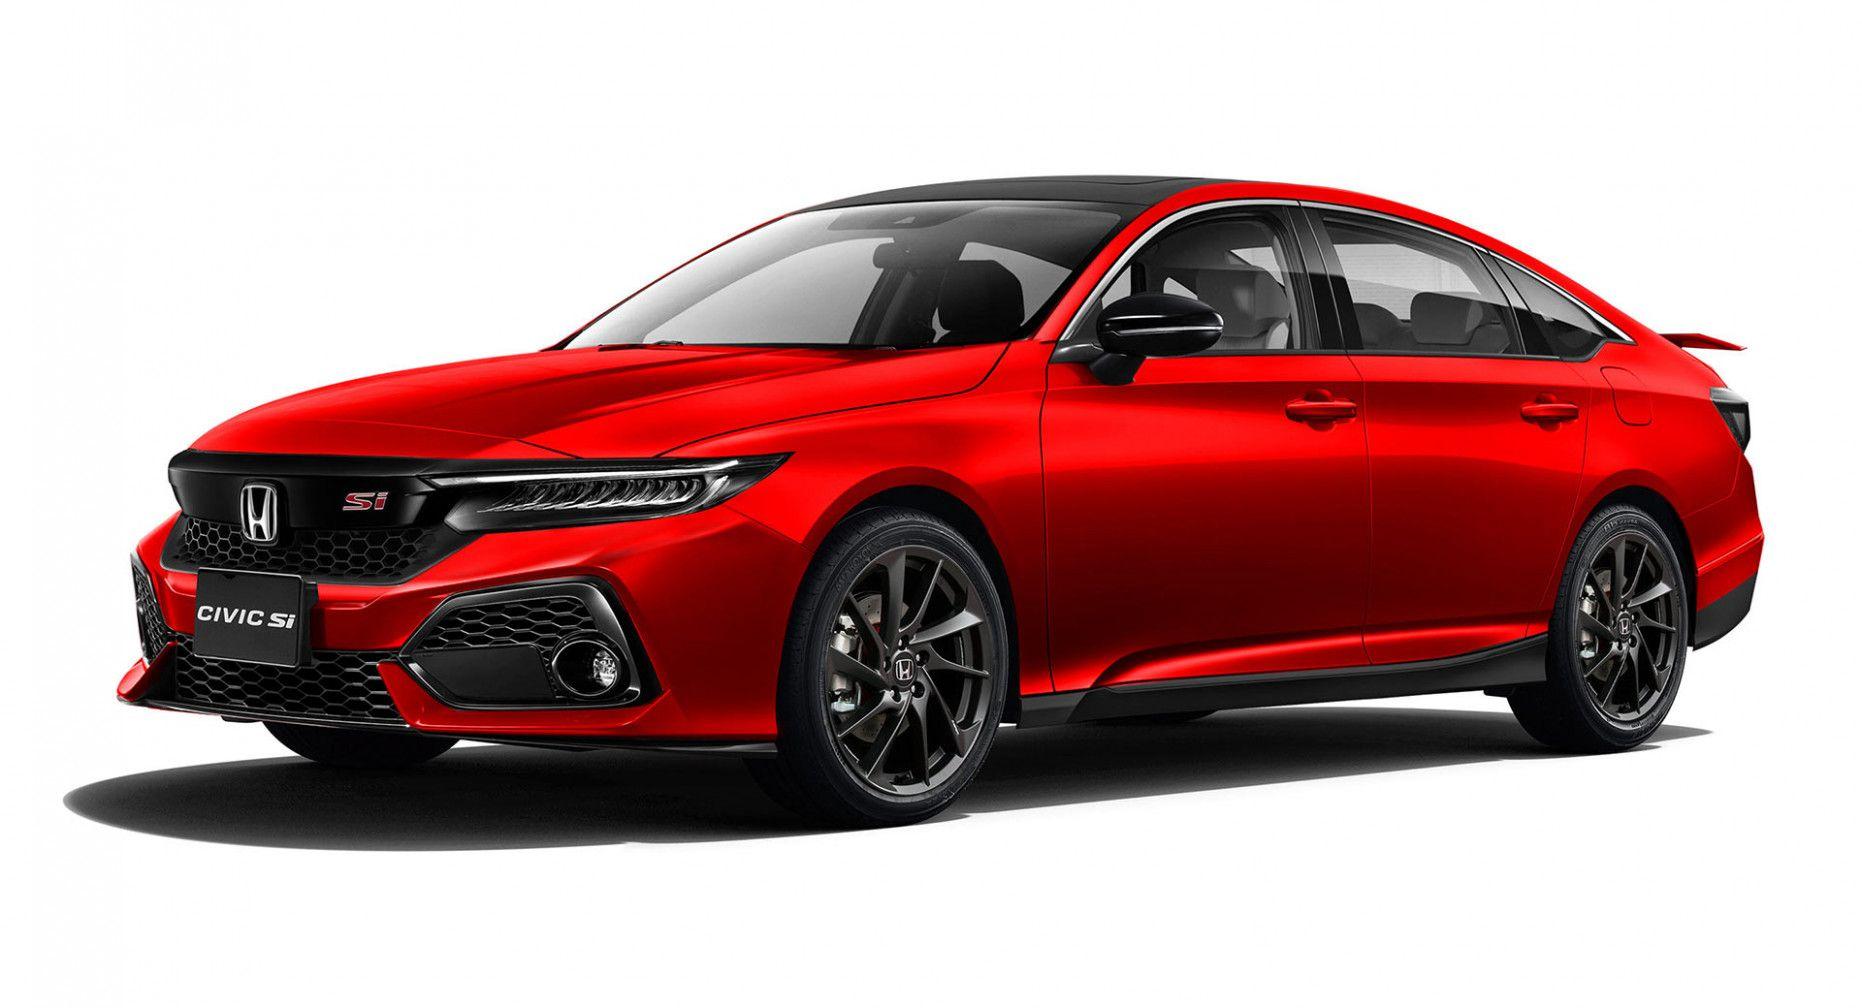 2022 Honda Civic Release Date Honda Civic Sedan Civic Sedan Honda Civic